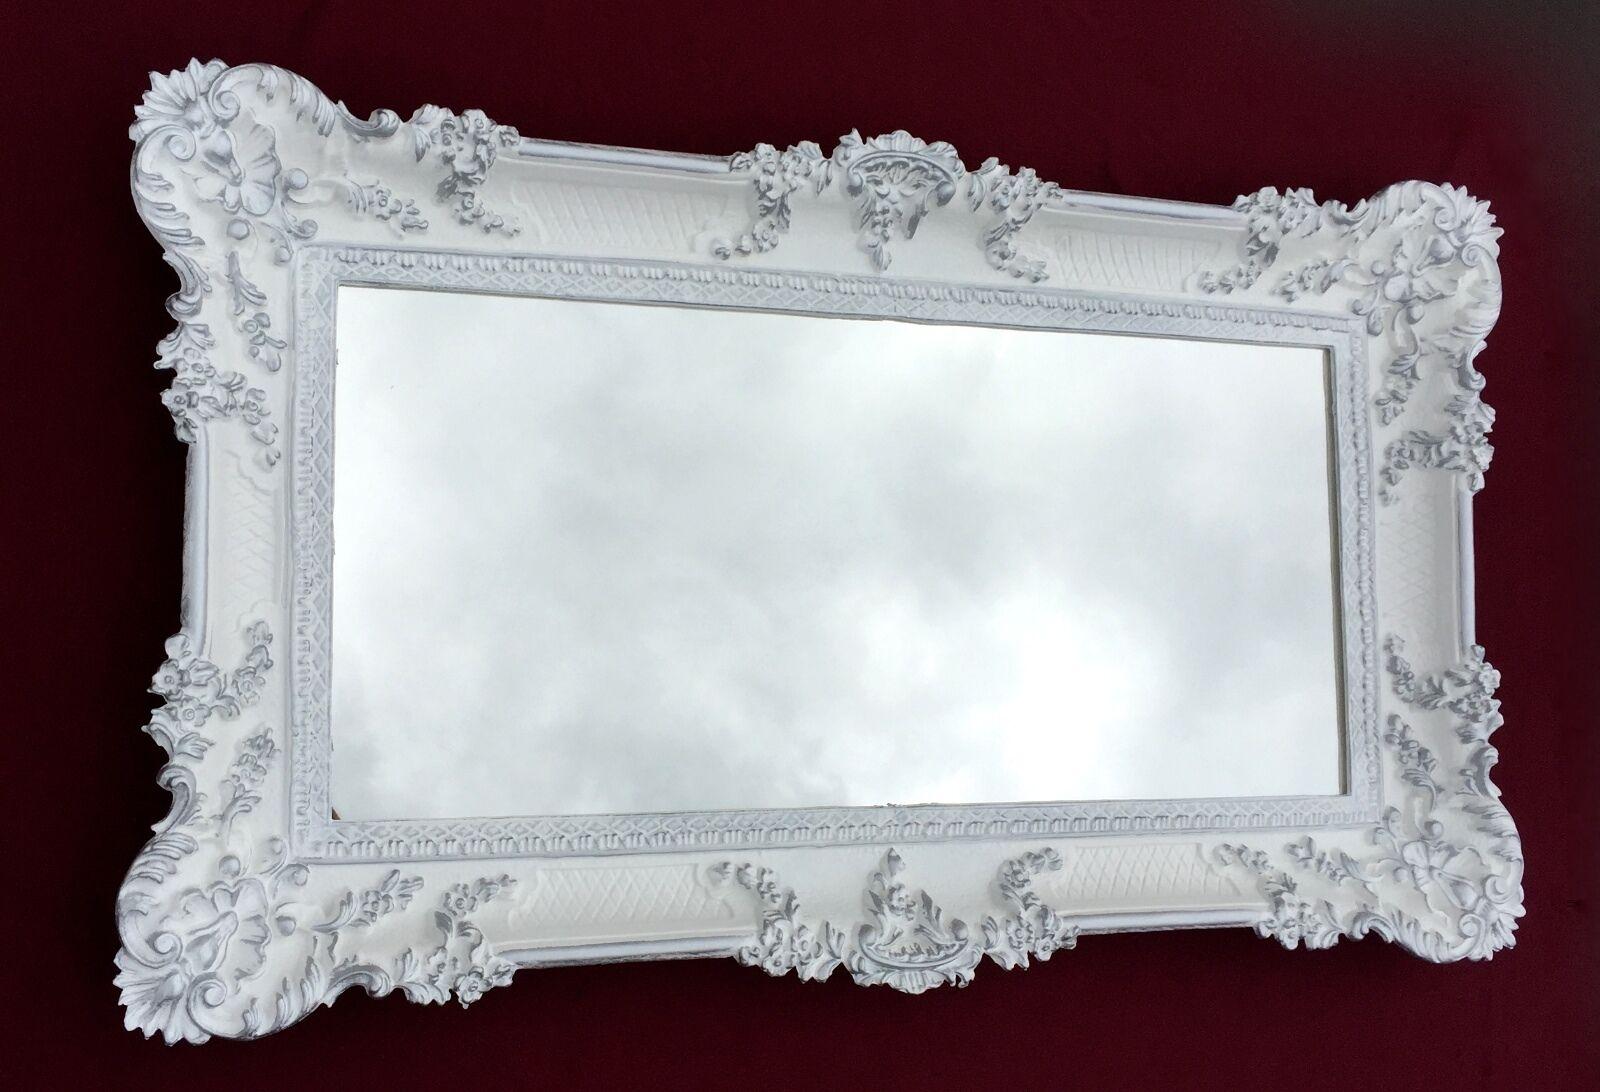 wandspiegel antik barock rechteckig 97x57 flurspiegel wei silber 103074 spiegel kaufen bei. Black Bedroom Furniture Sets. Home Design Ideas